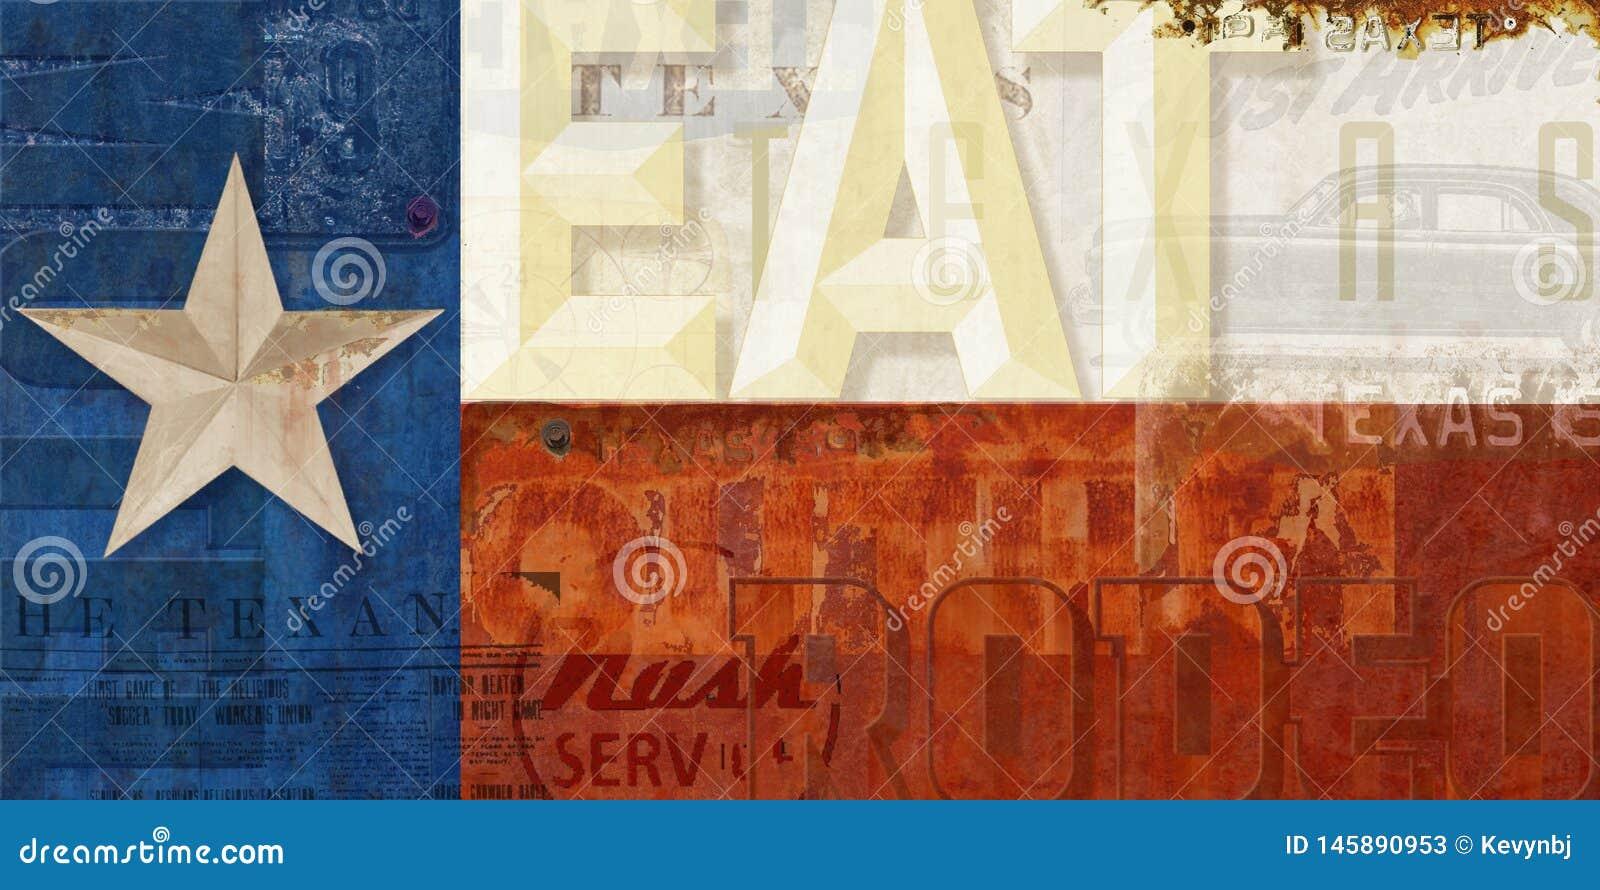 Serviço Route 66 do motel de Texas Flag Grunge Eat Rodeo